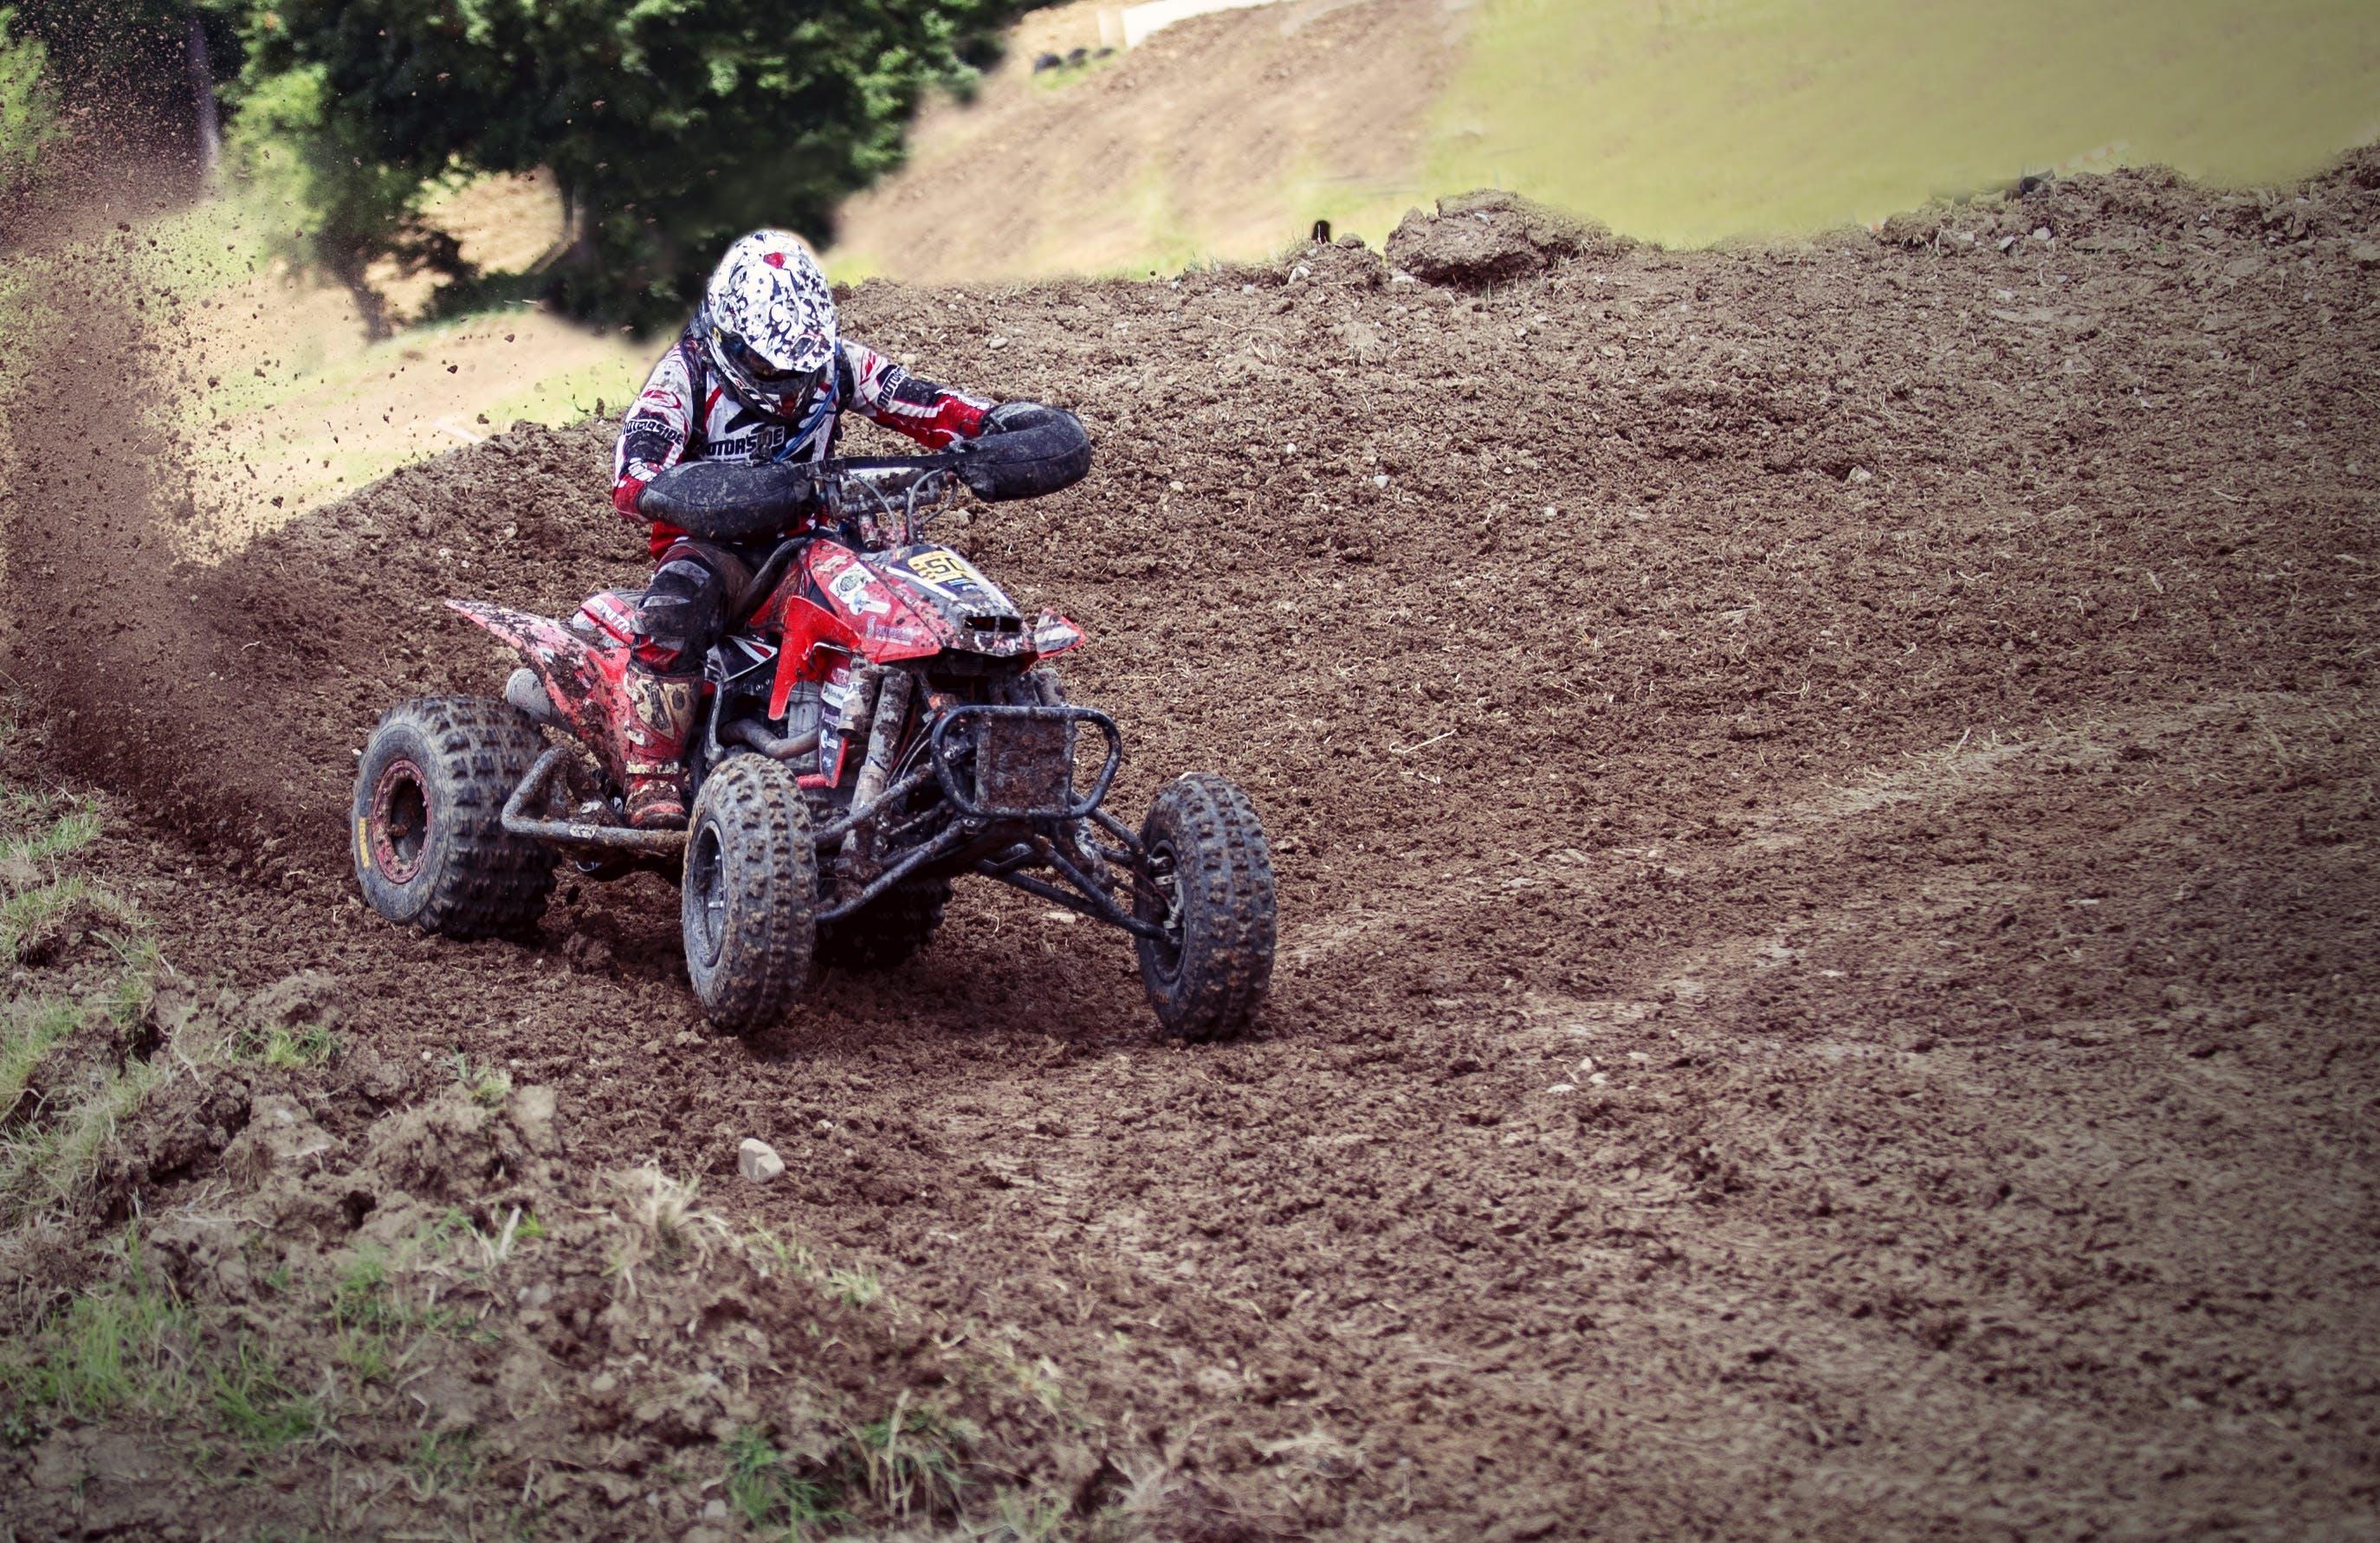 Free stock photo of moto racing